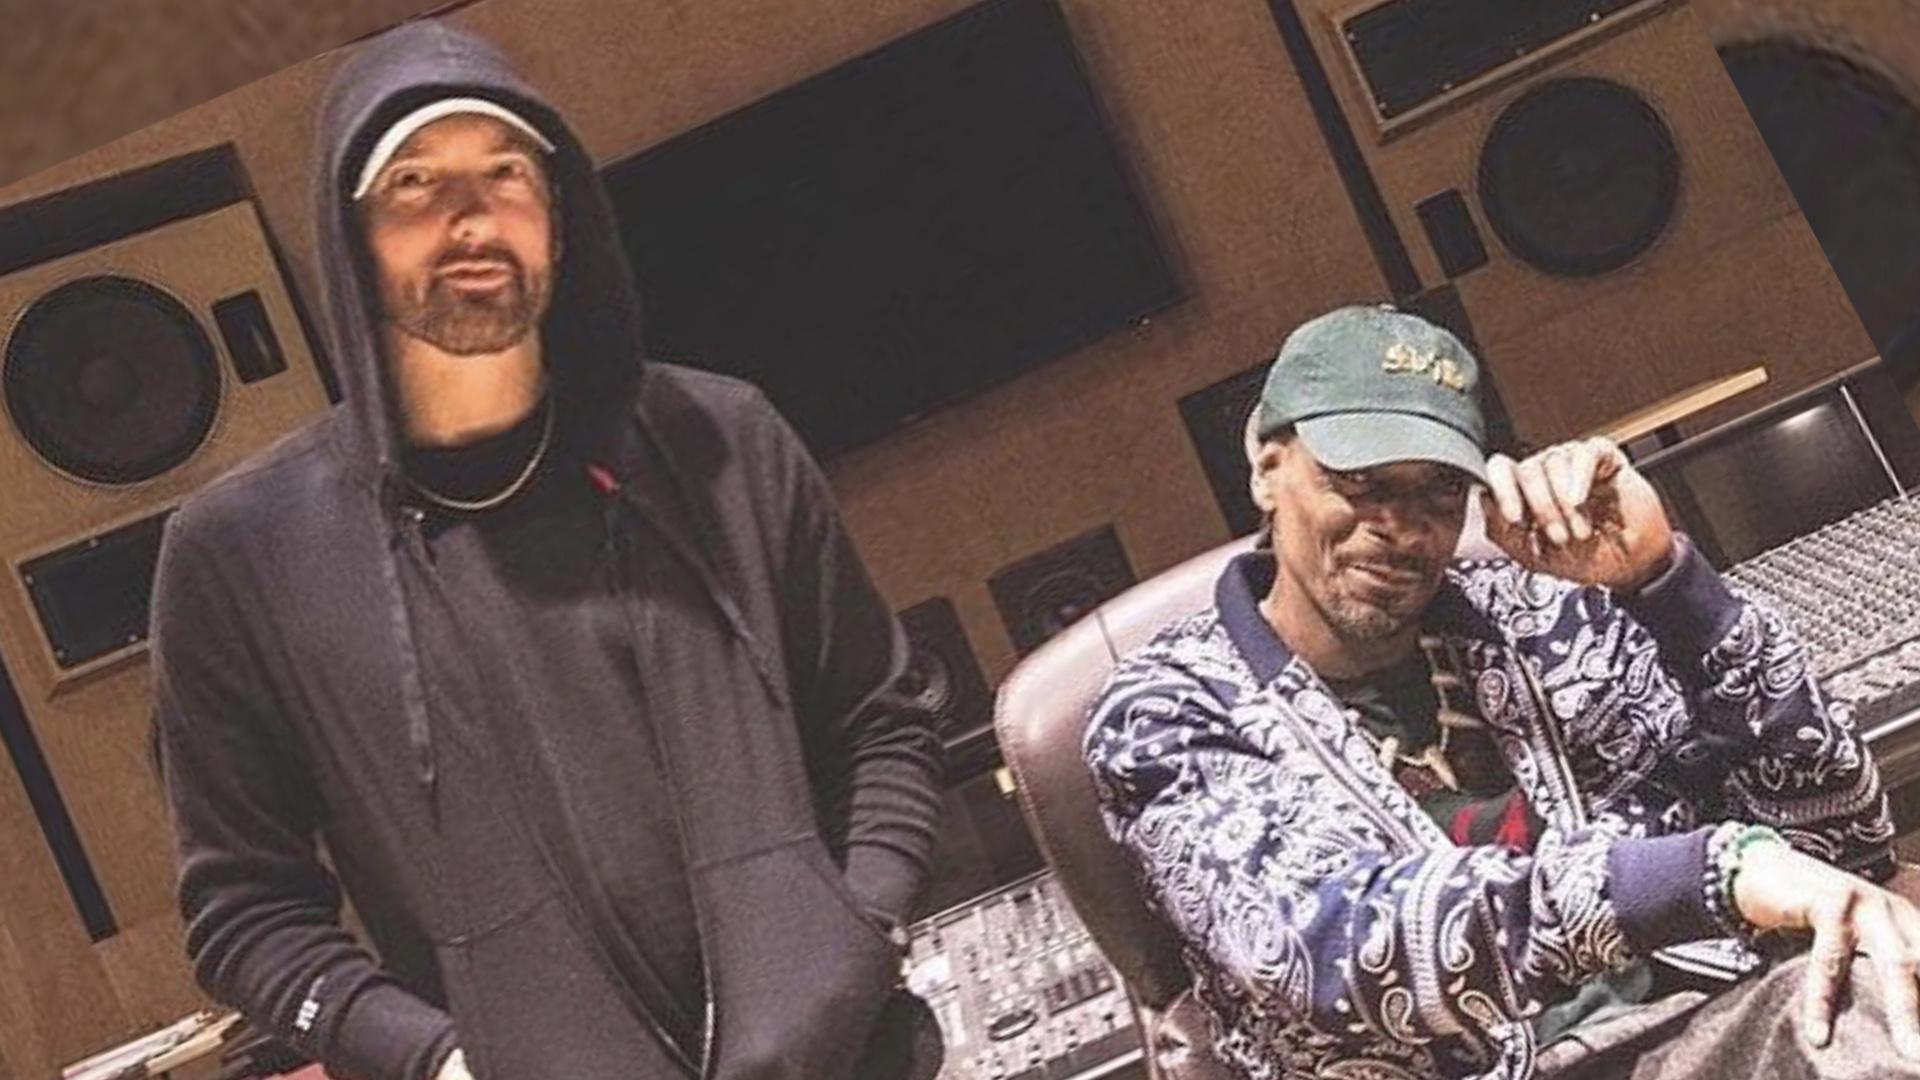 Snoop Dogg feat. Kokane – Talk Dat Shit To Me (Eminem Reference Track)